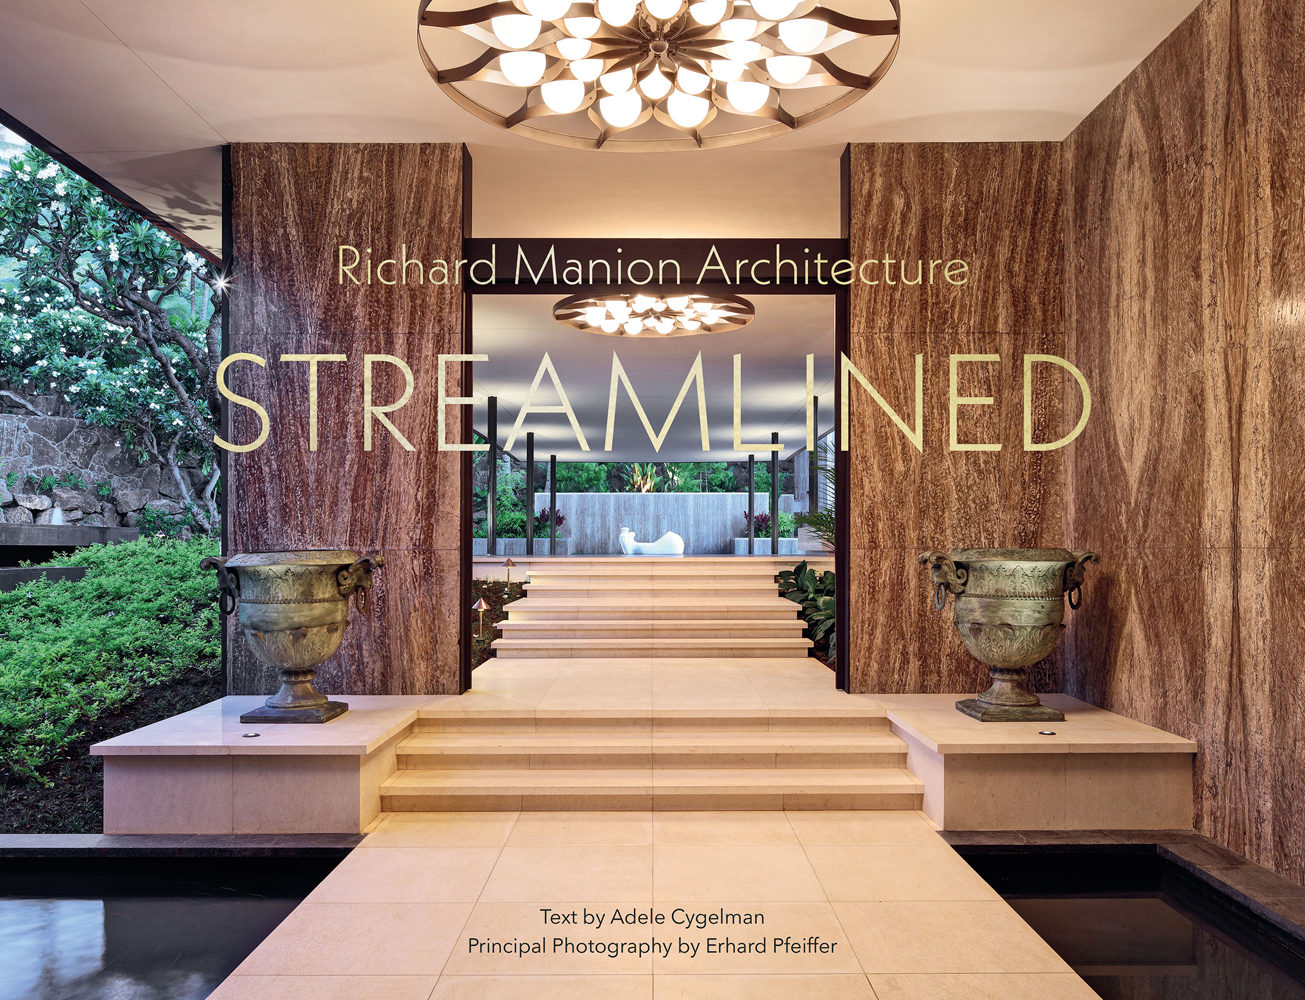 Richard Manion Architecture